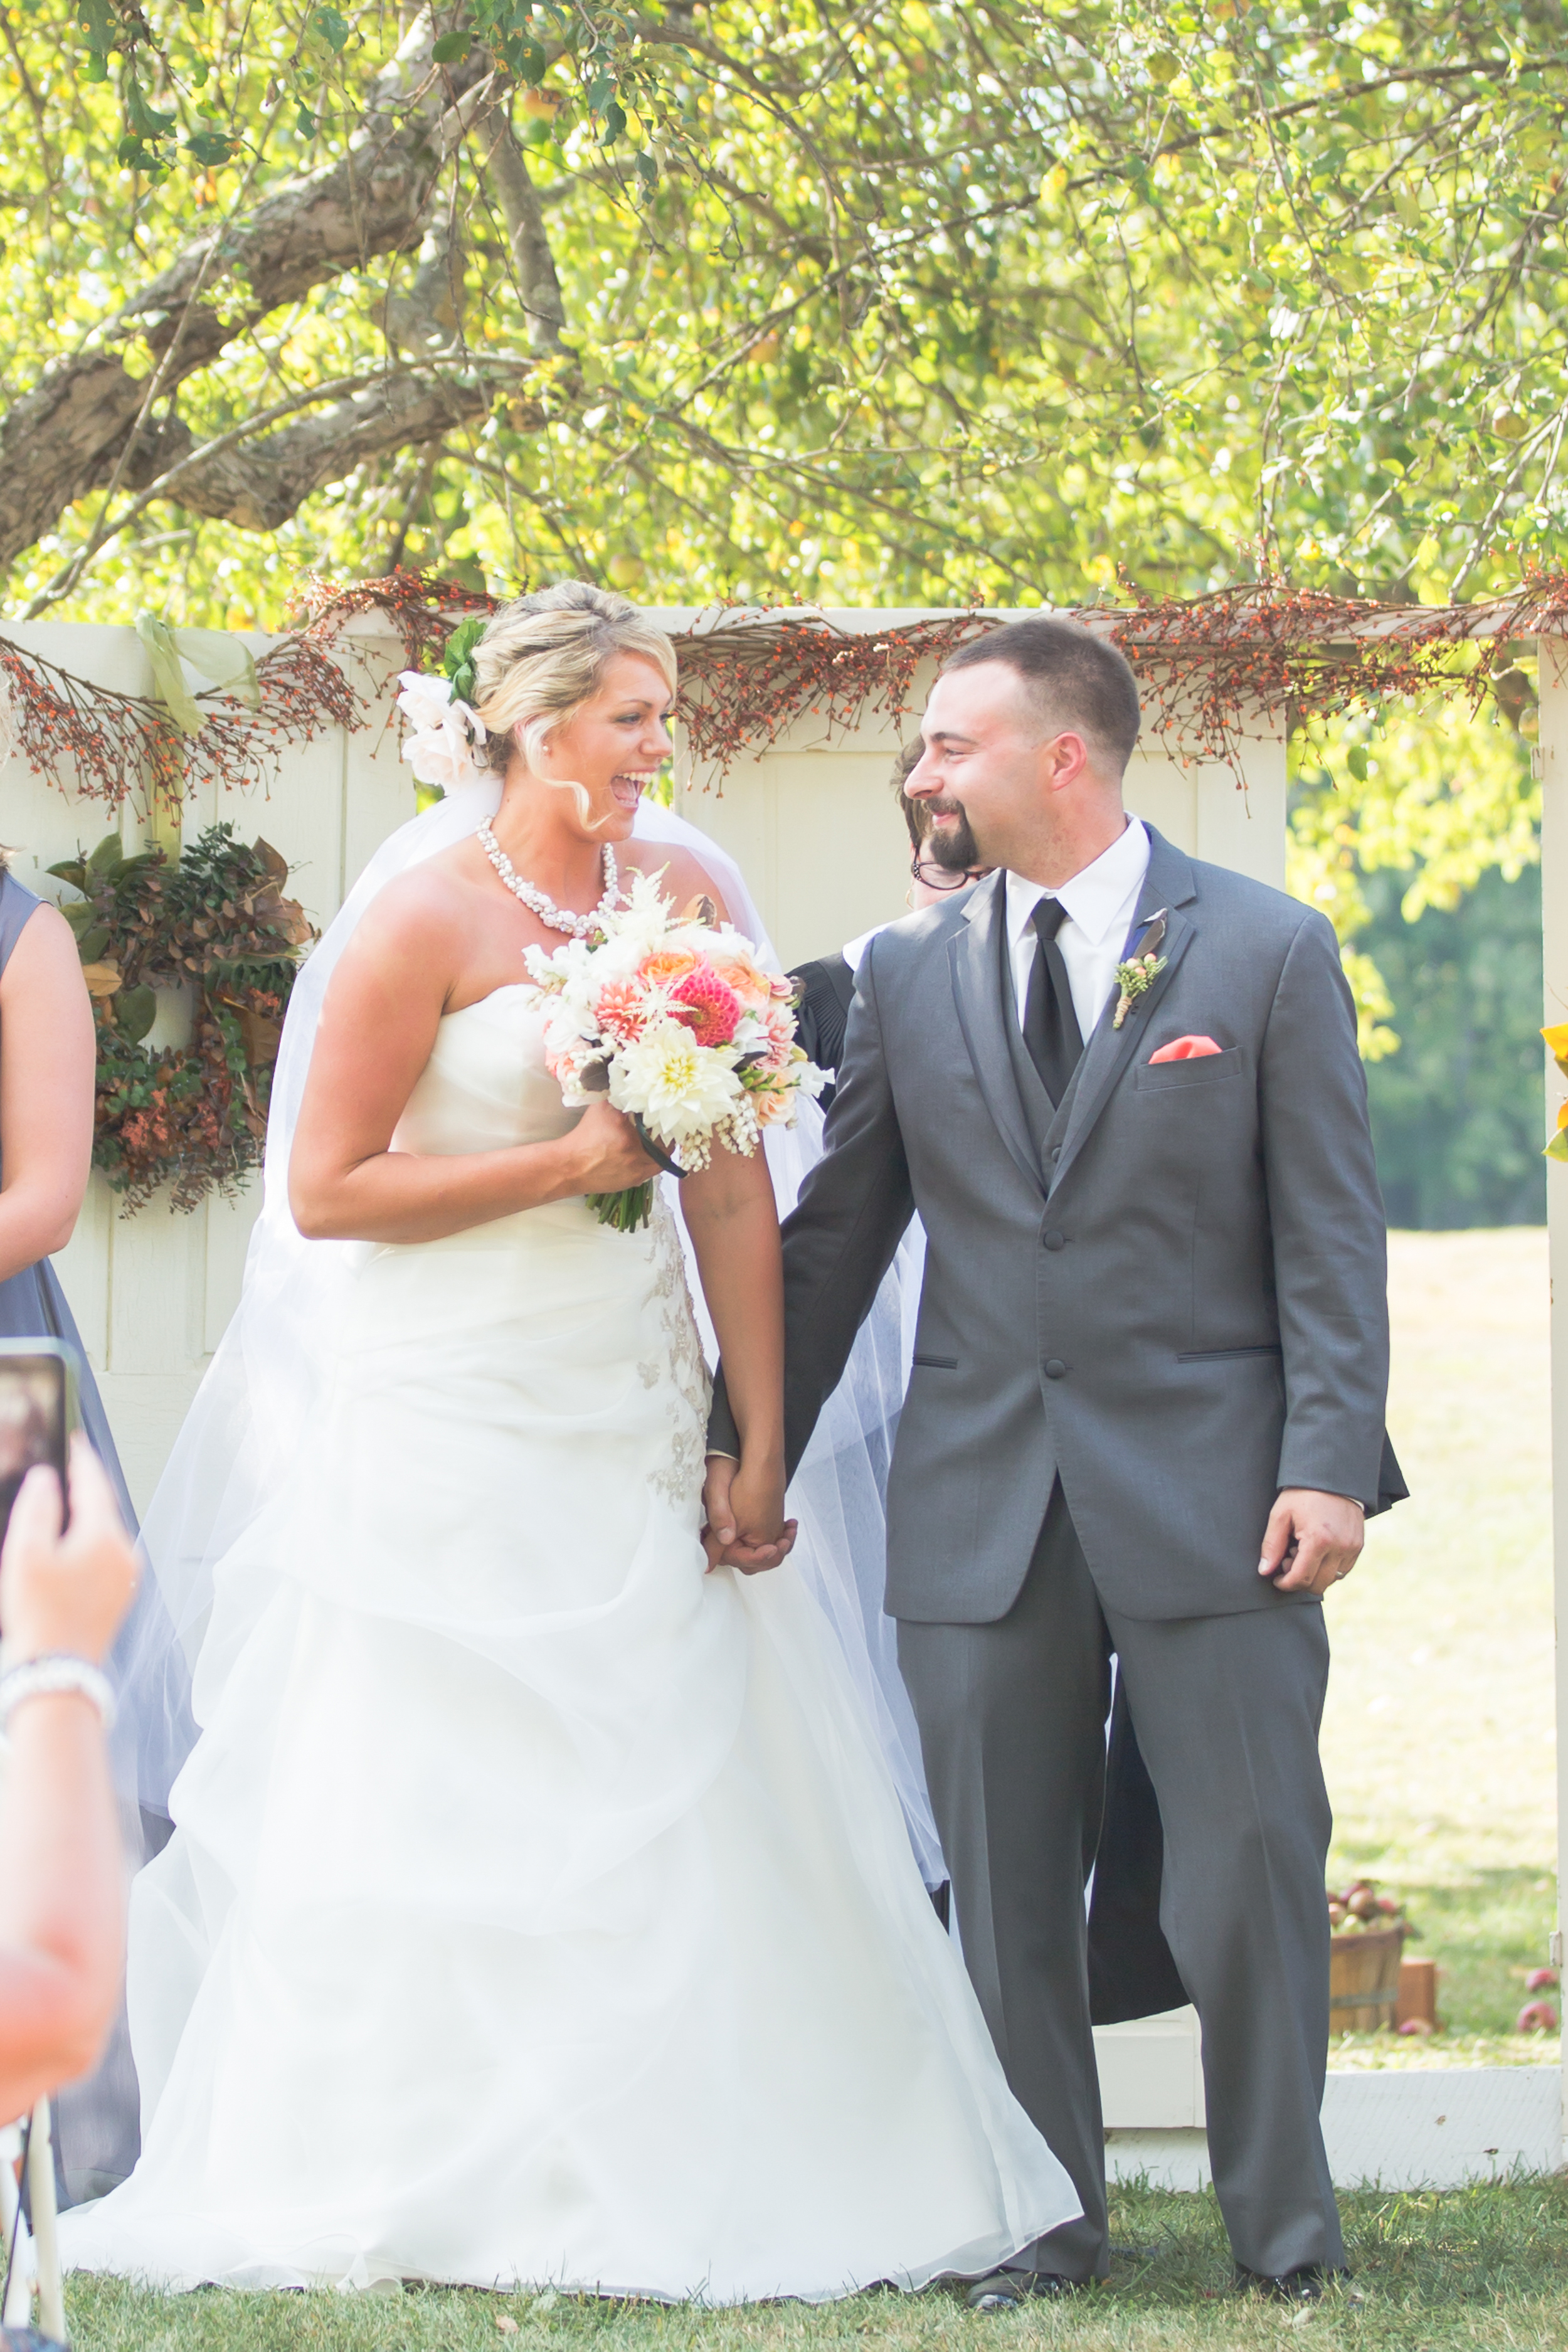 nh-wedding-photographer-amy-brown-photography-0444.JPG